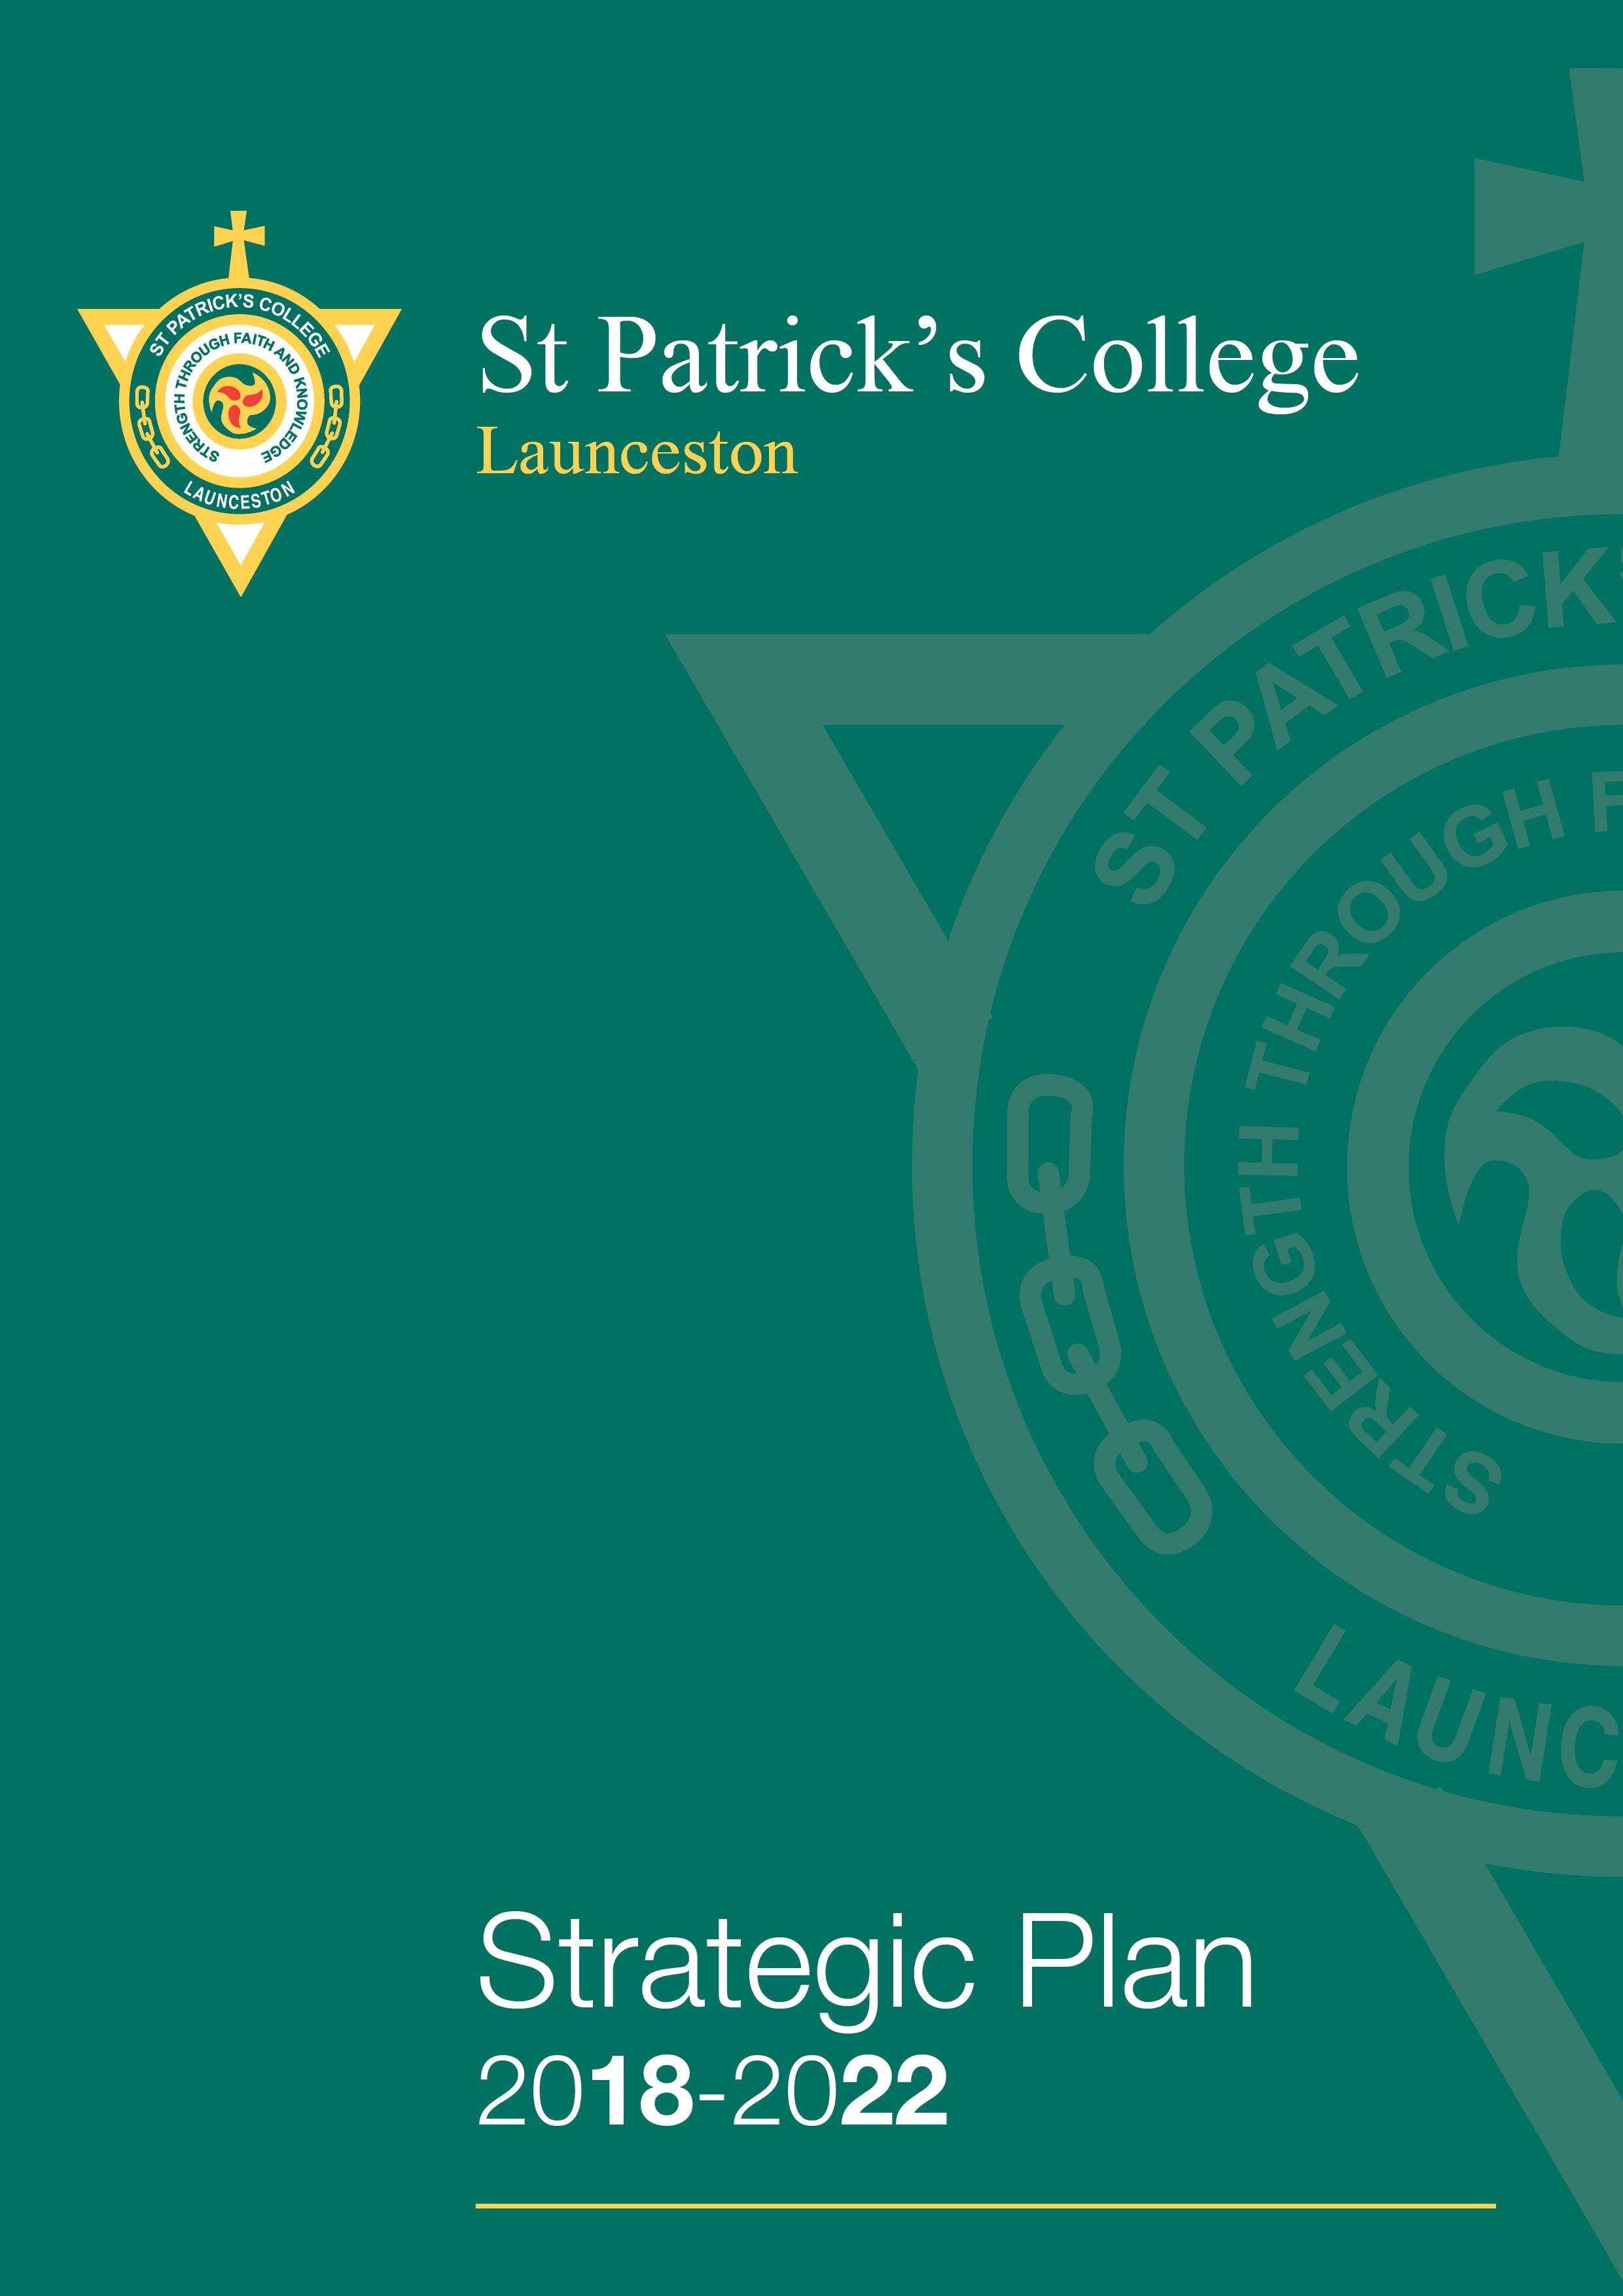 St Patrick's College Strategic Plan 2018-2022